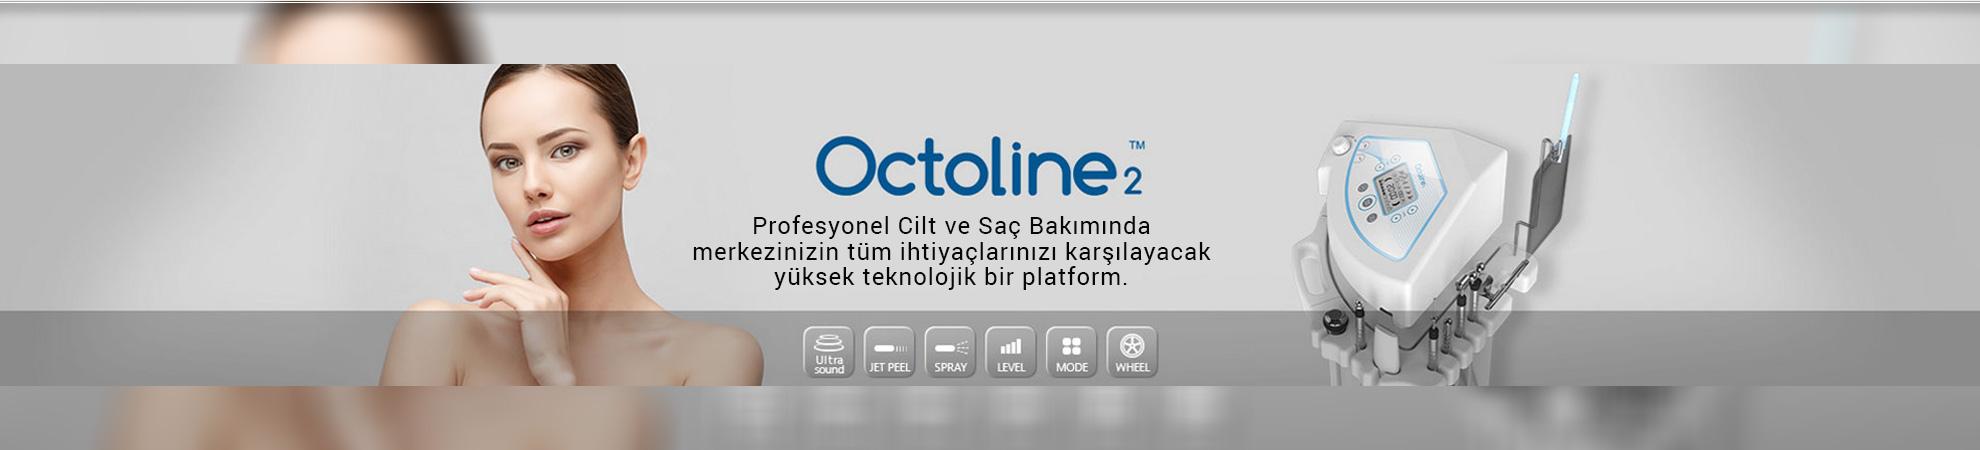 octoline-banner